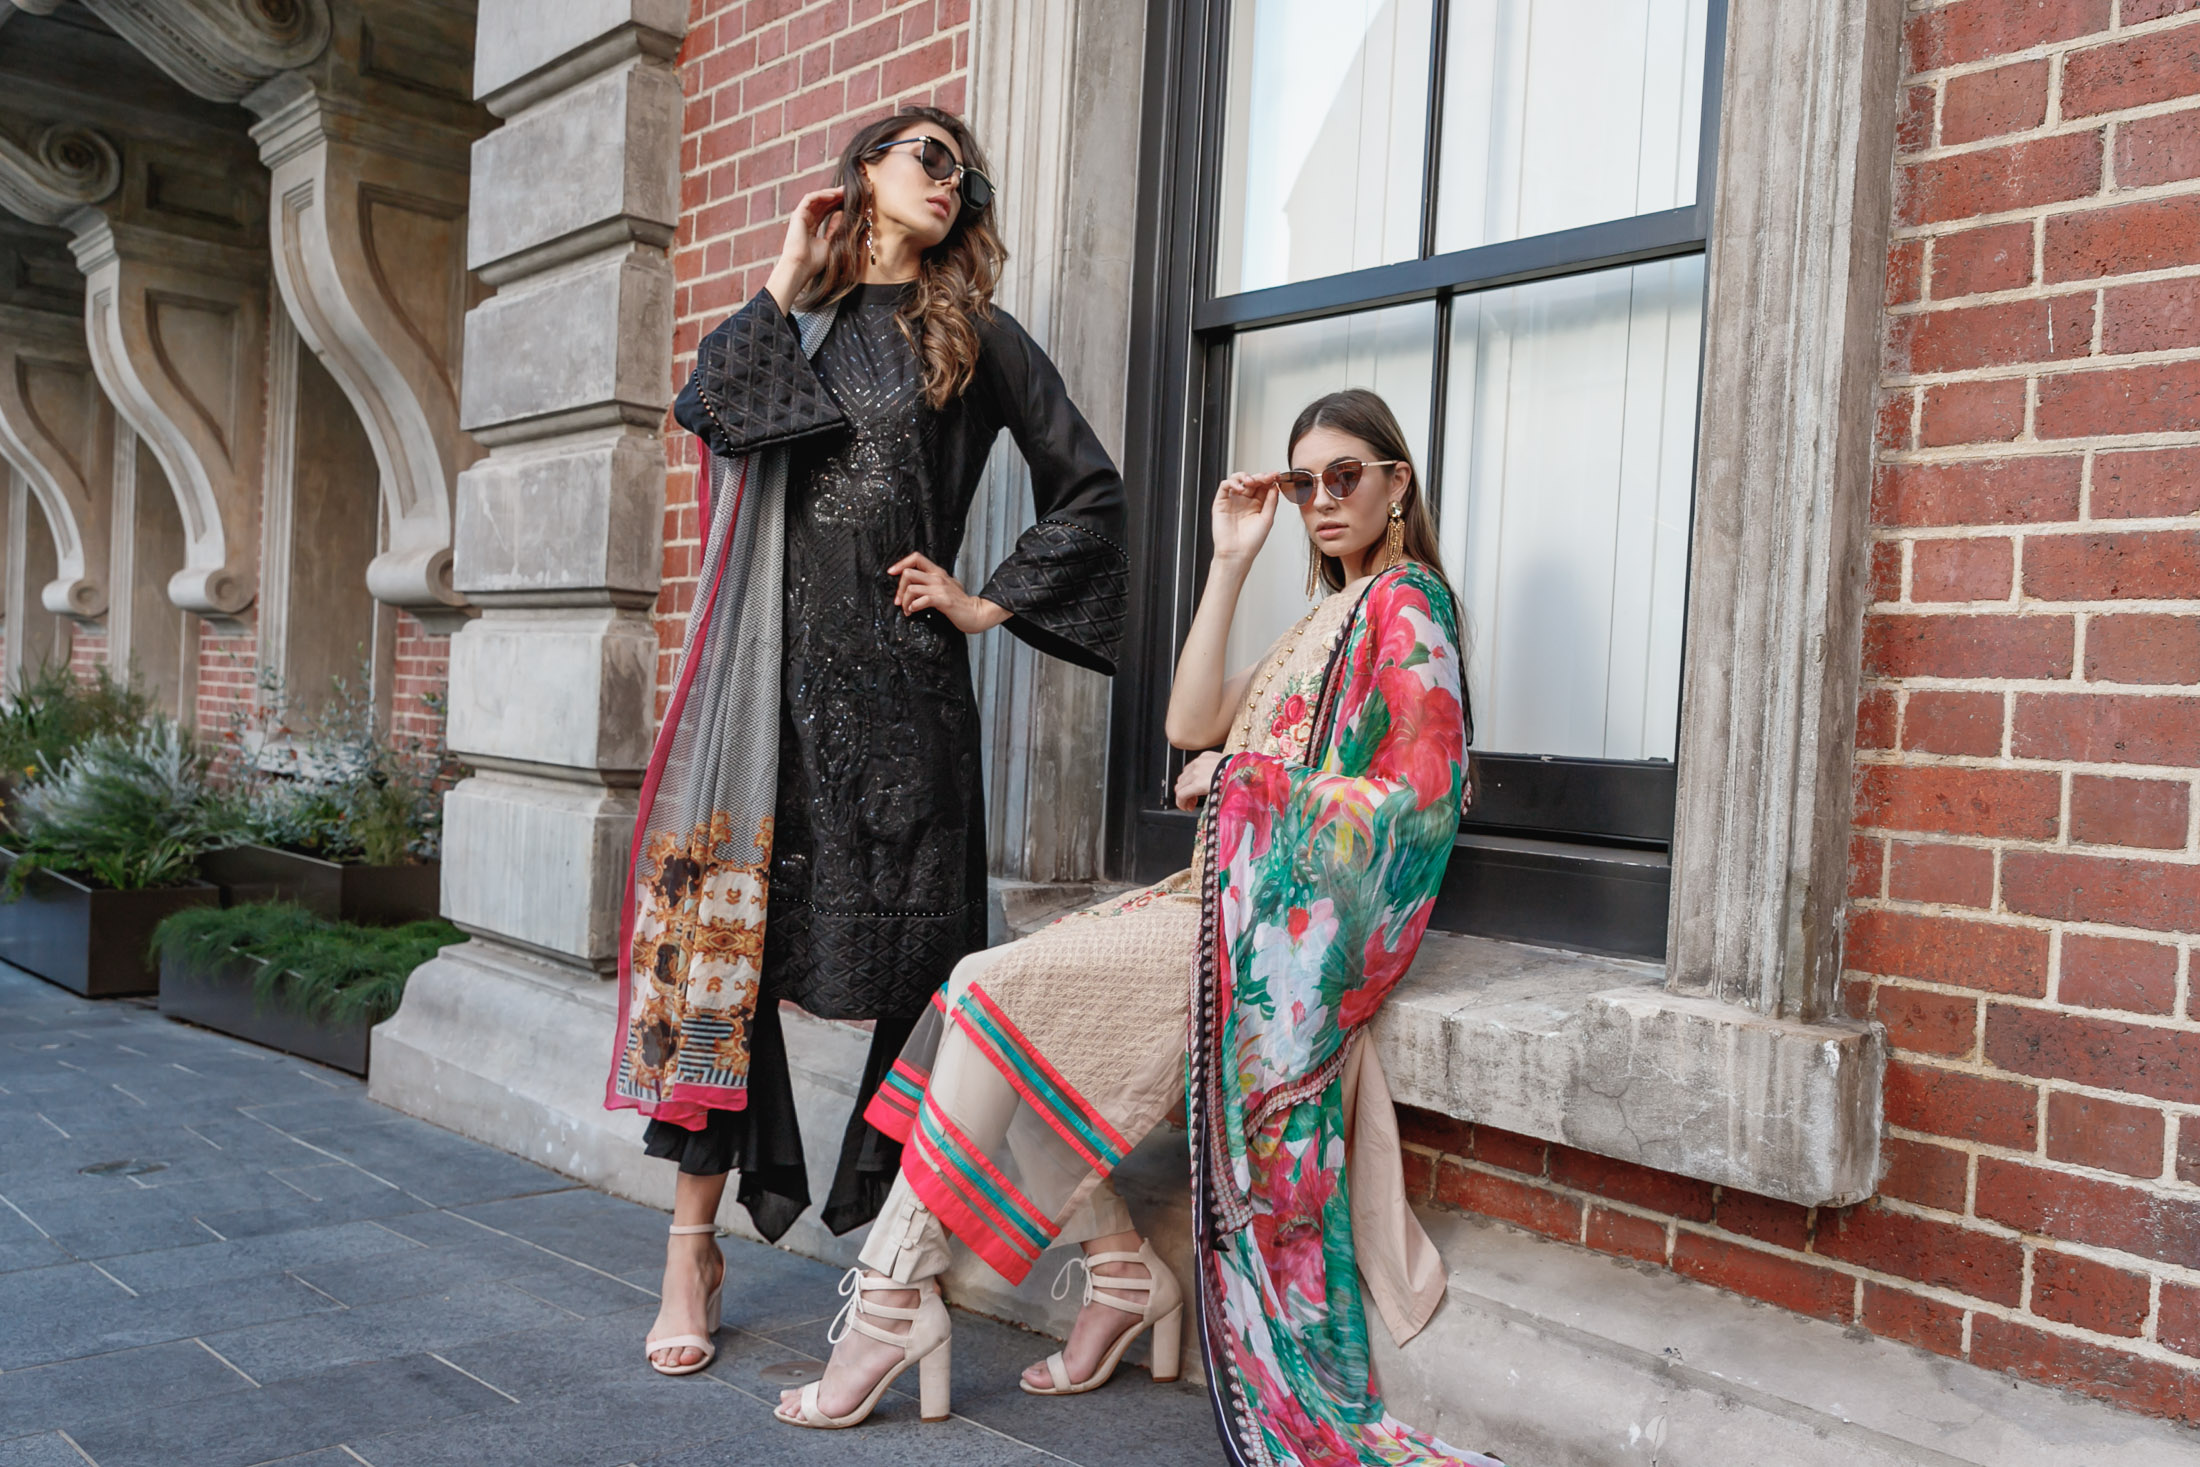 Ammon_Creative-Fashion_Photography-Vogue_Sultana_Bangladesh-Old_Treasury-Perth-001-0913.jpg